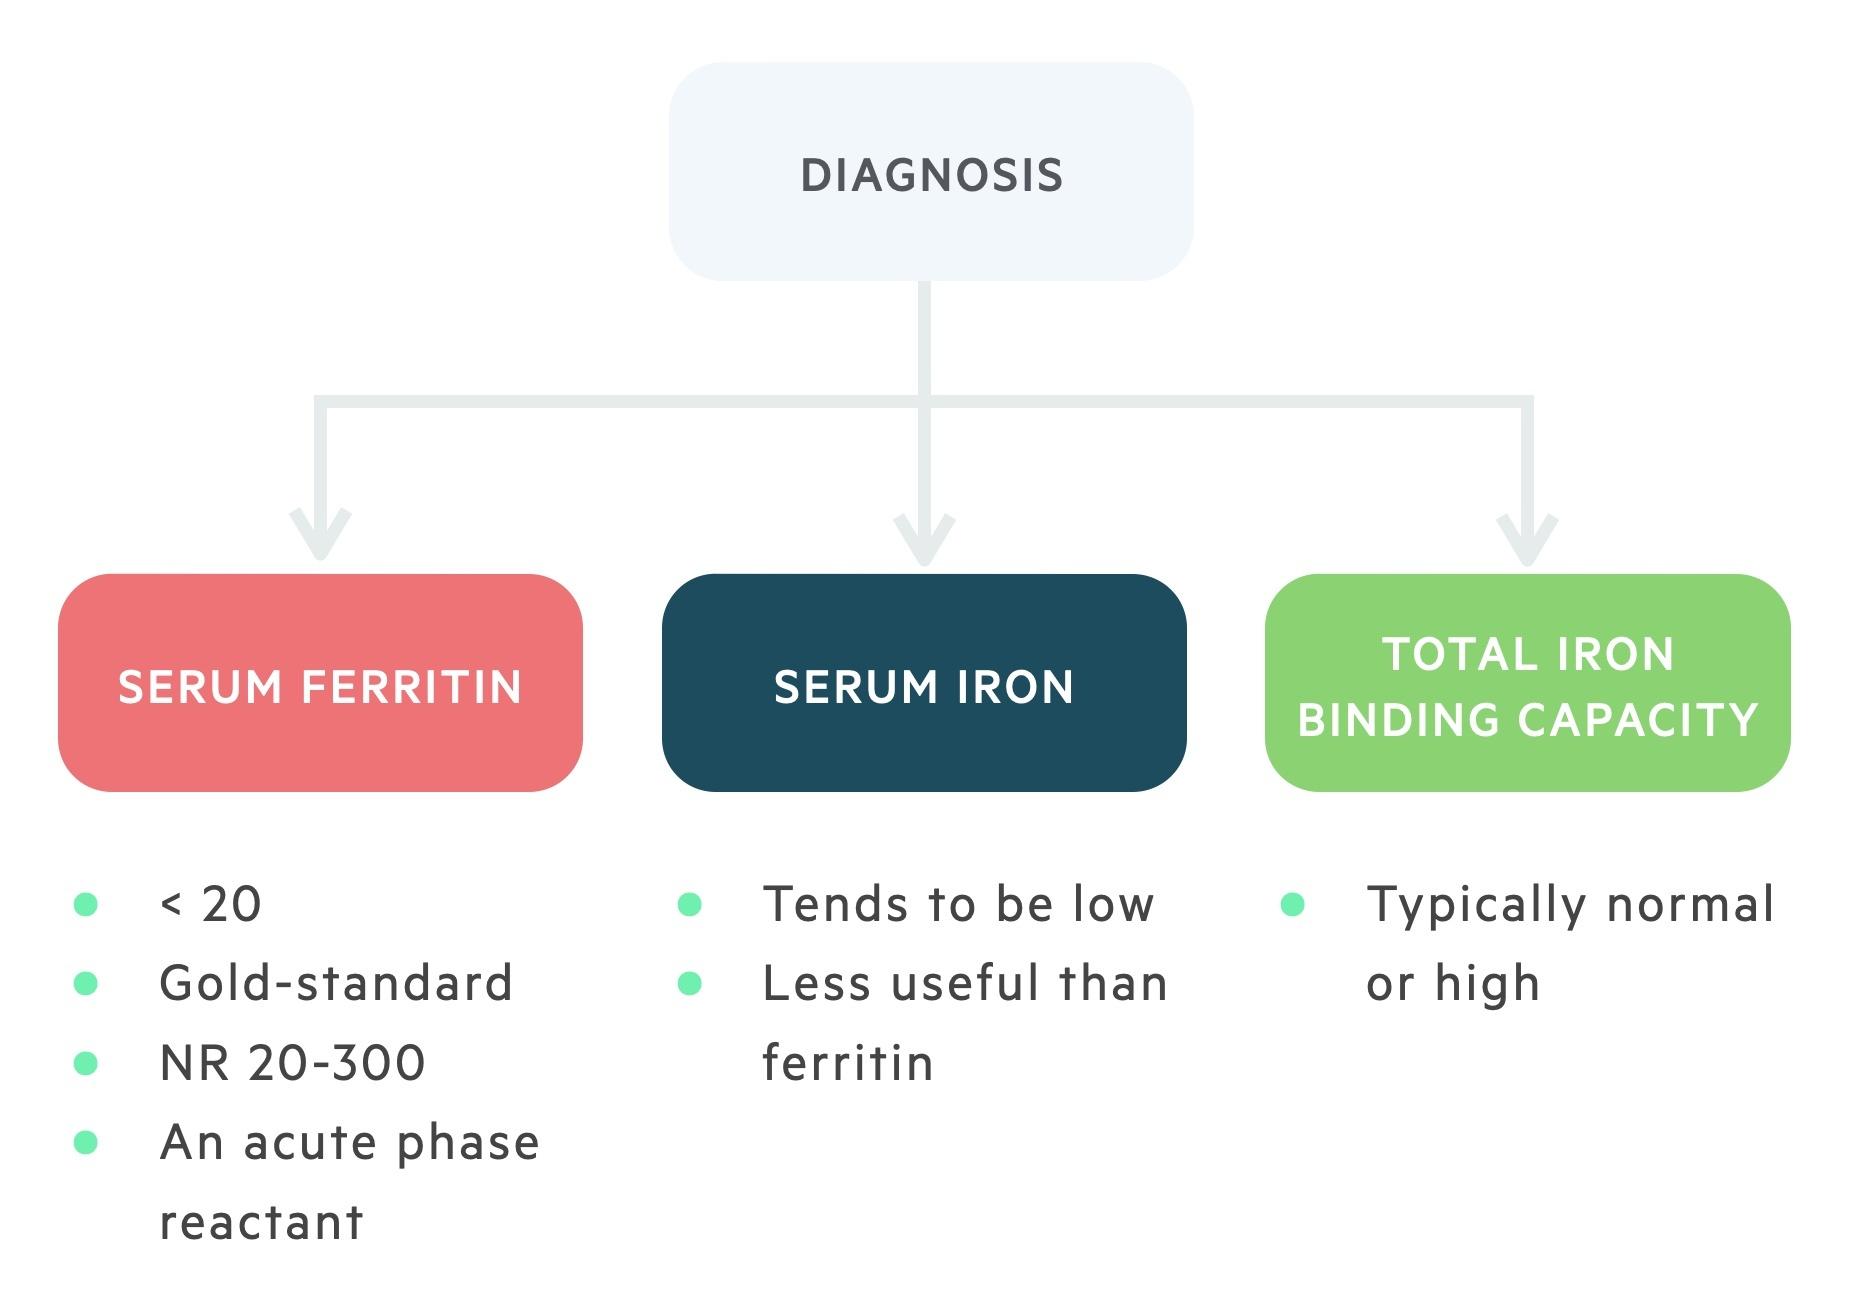 Diagnosis of IDA